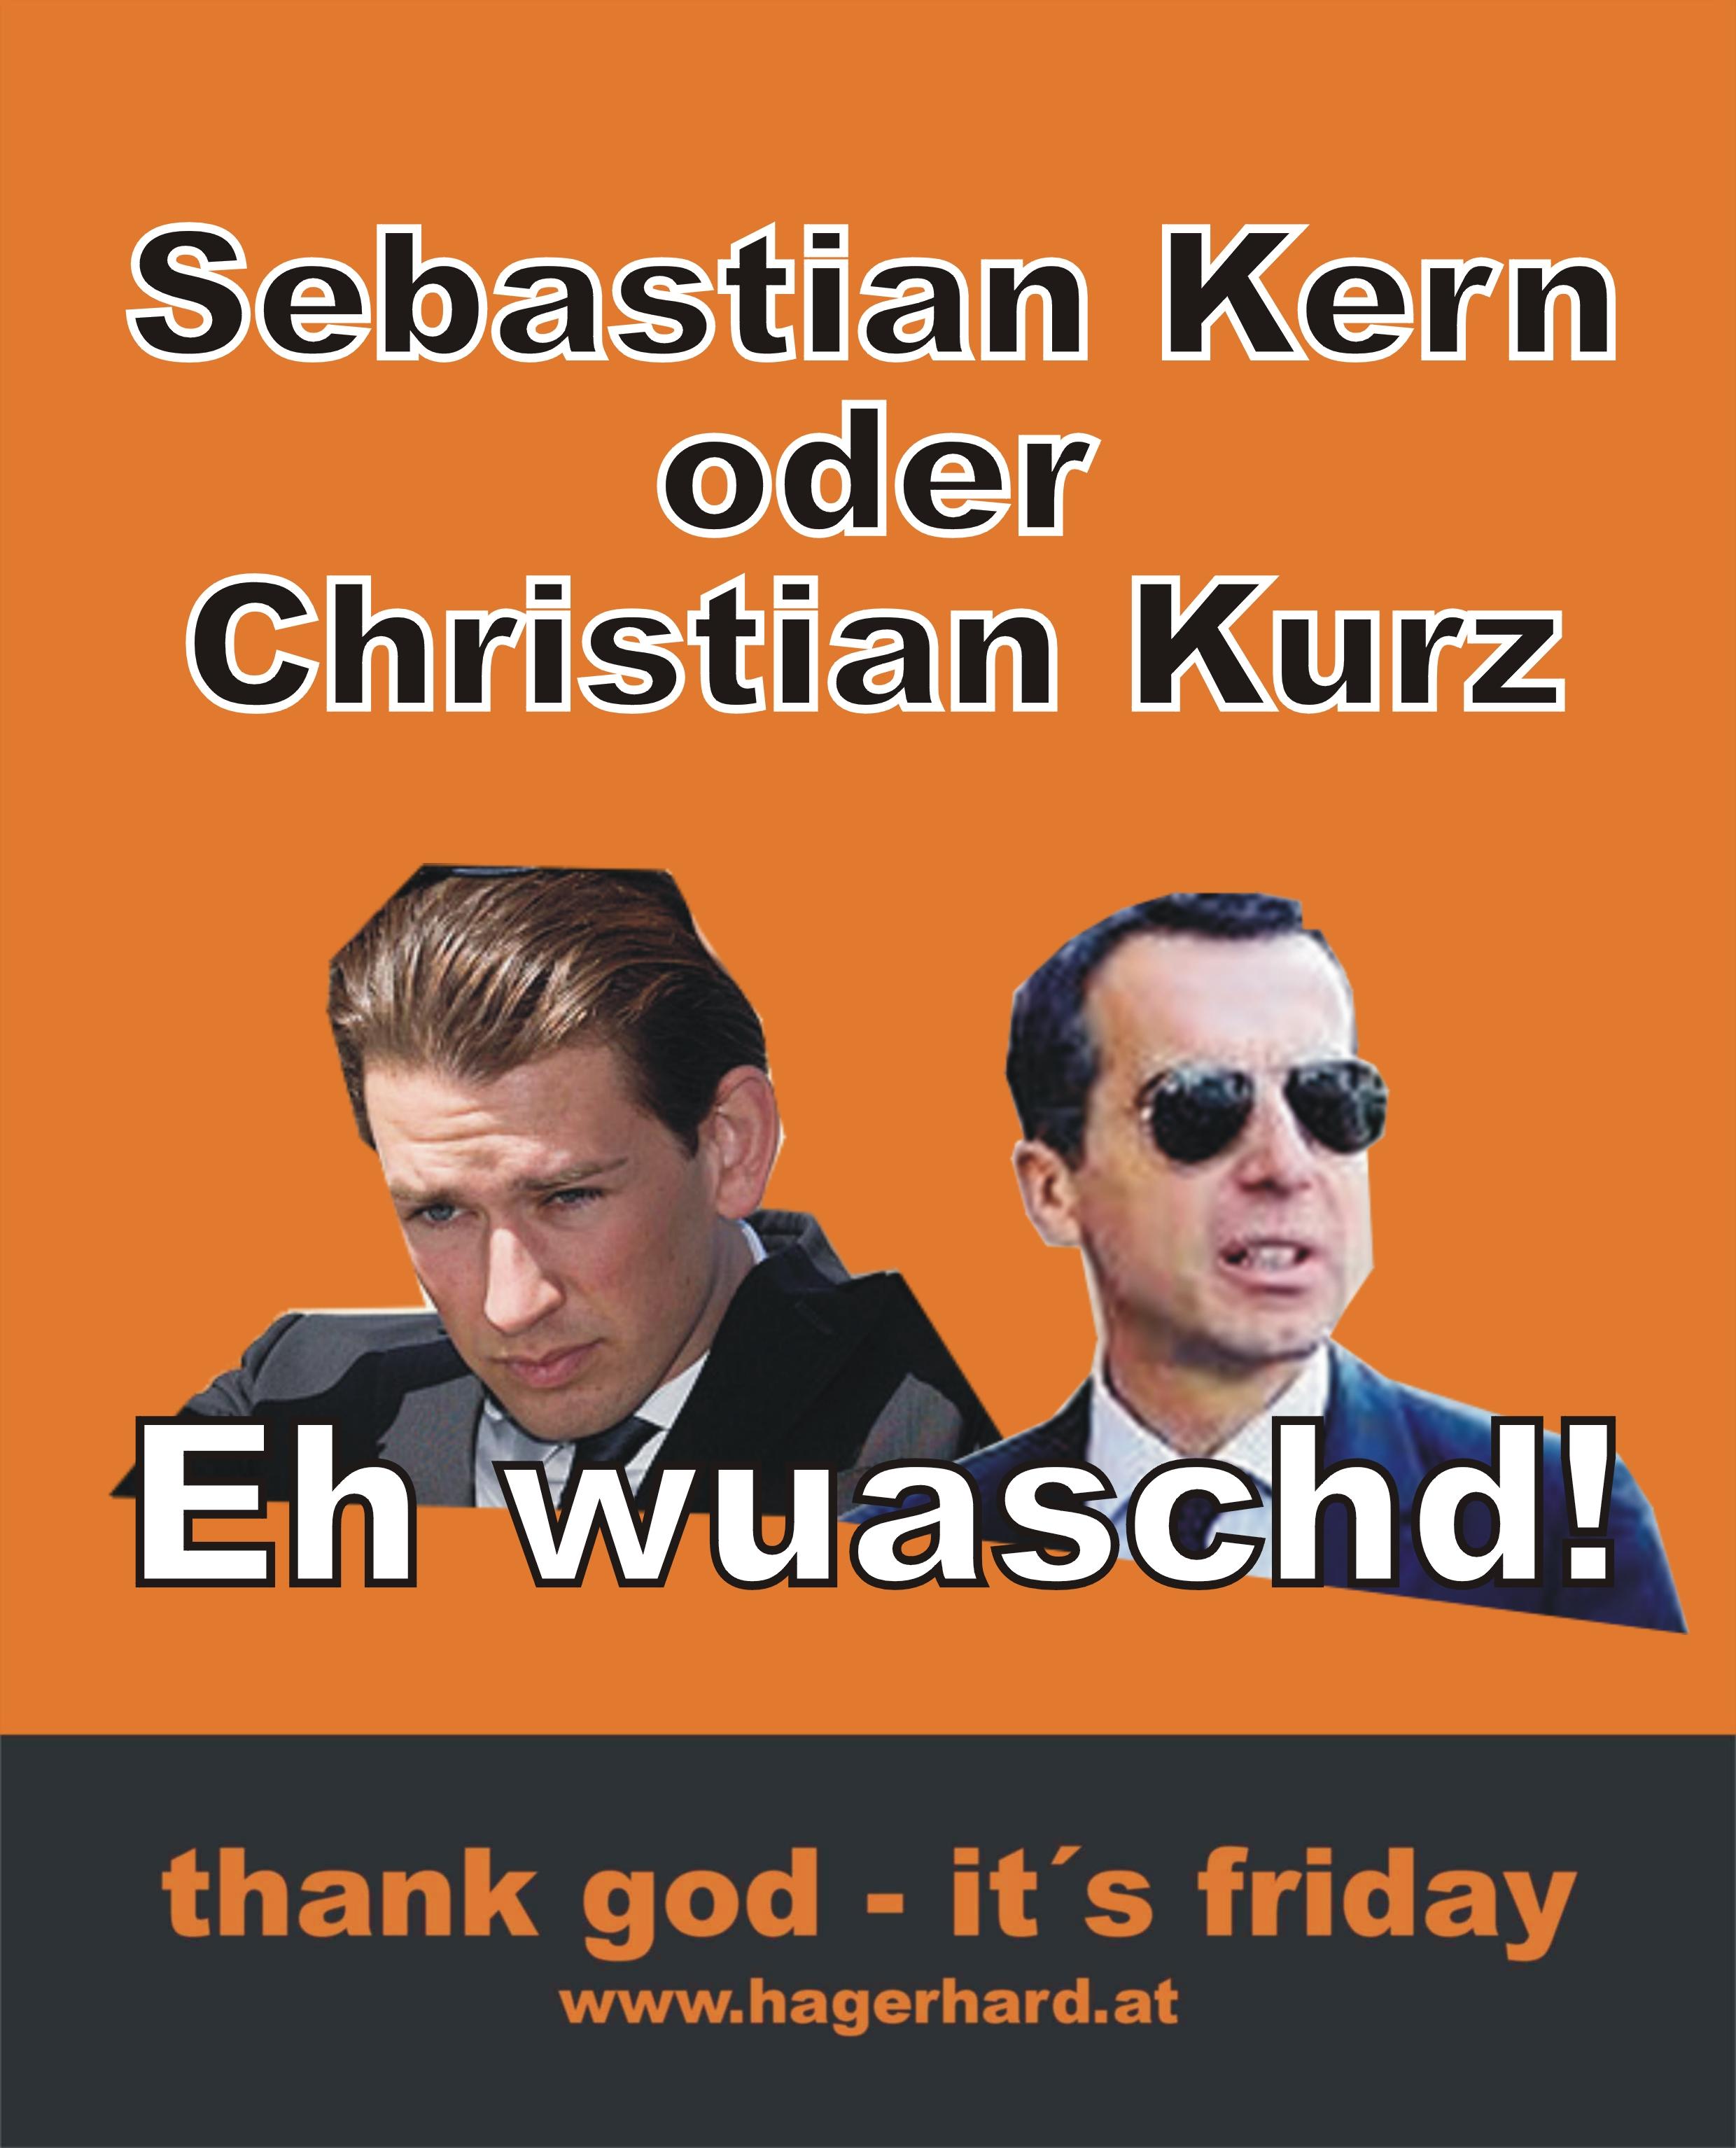 Sebastian Kern oder Christian Kurz